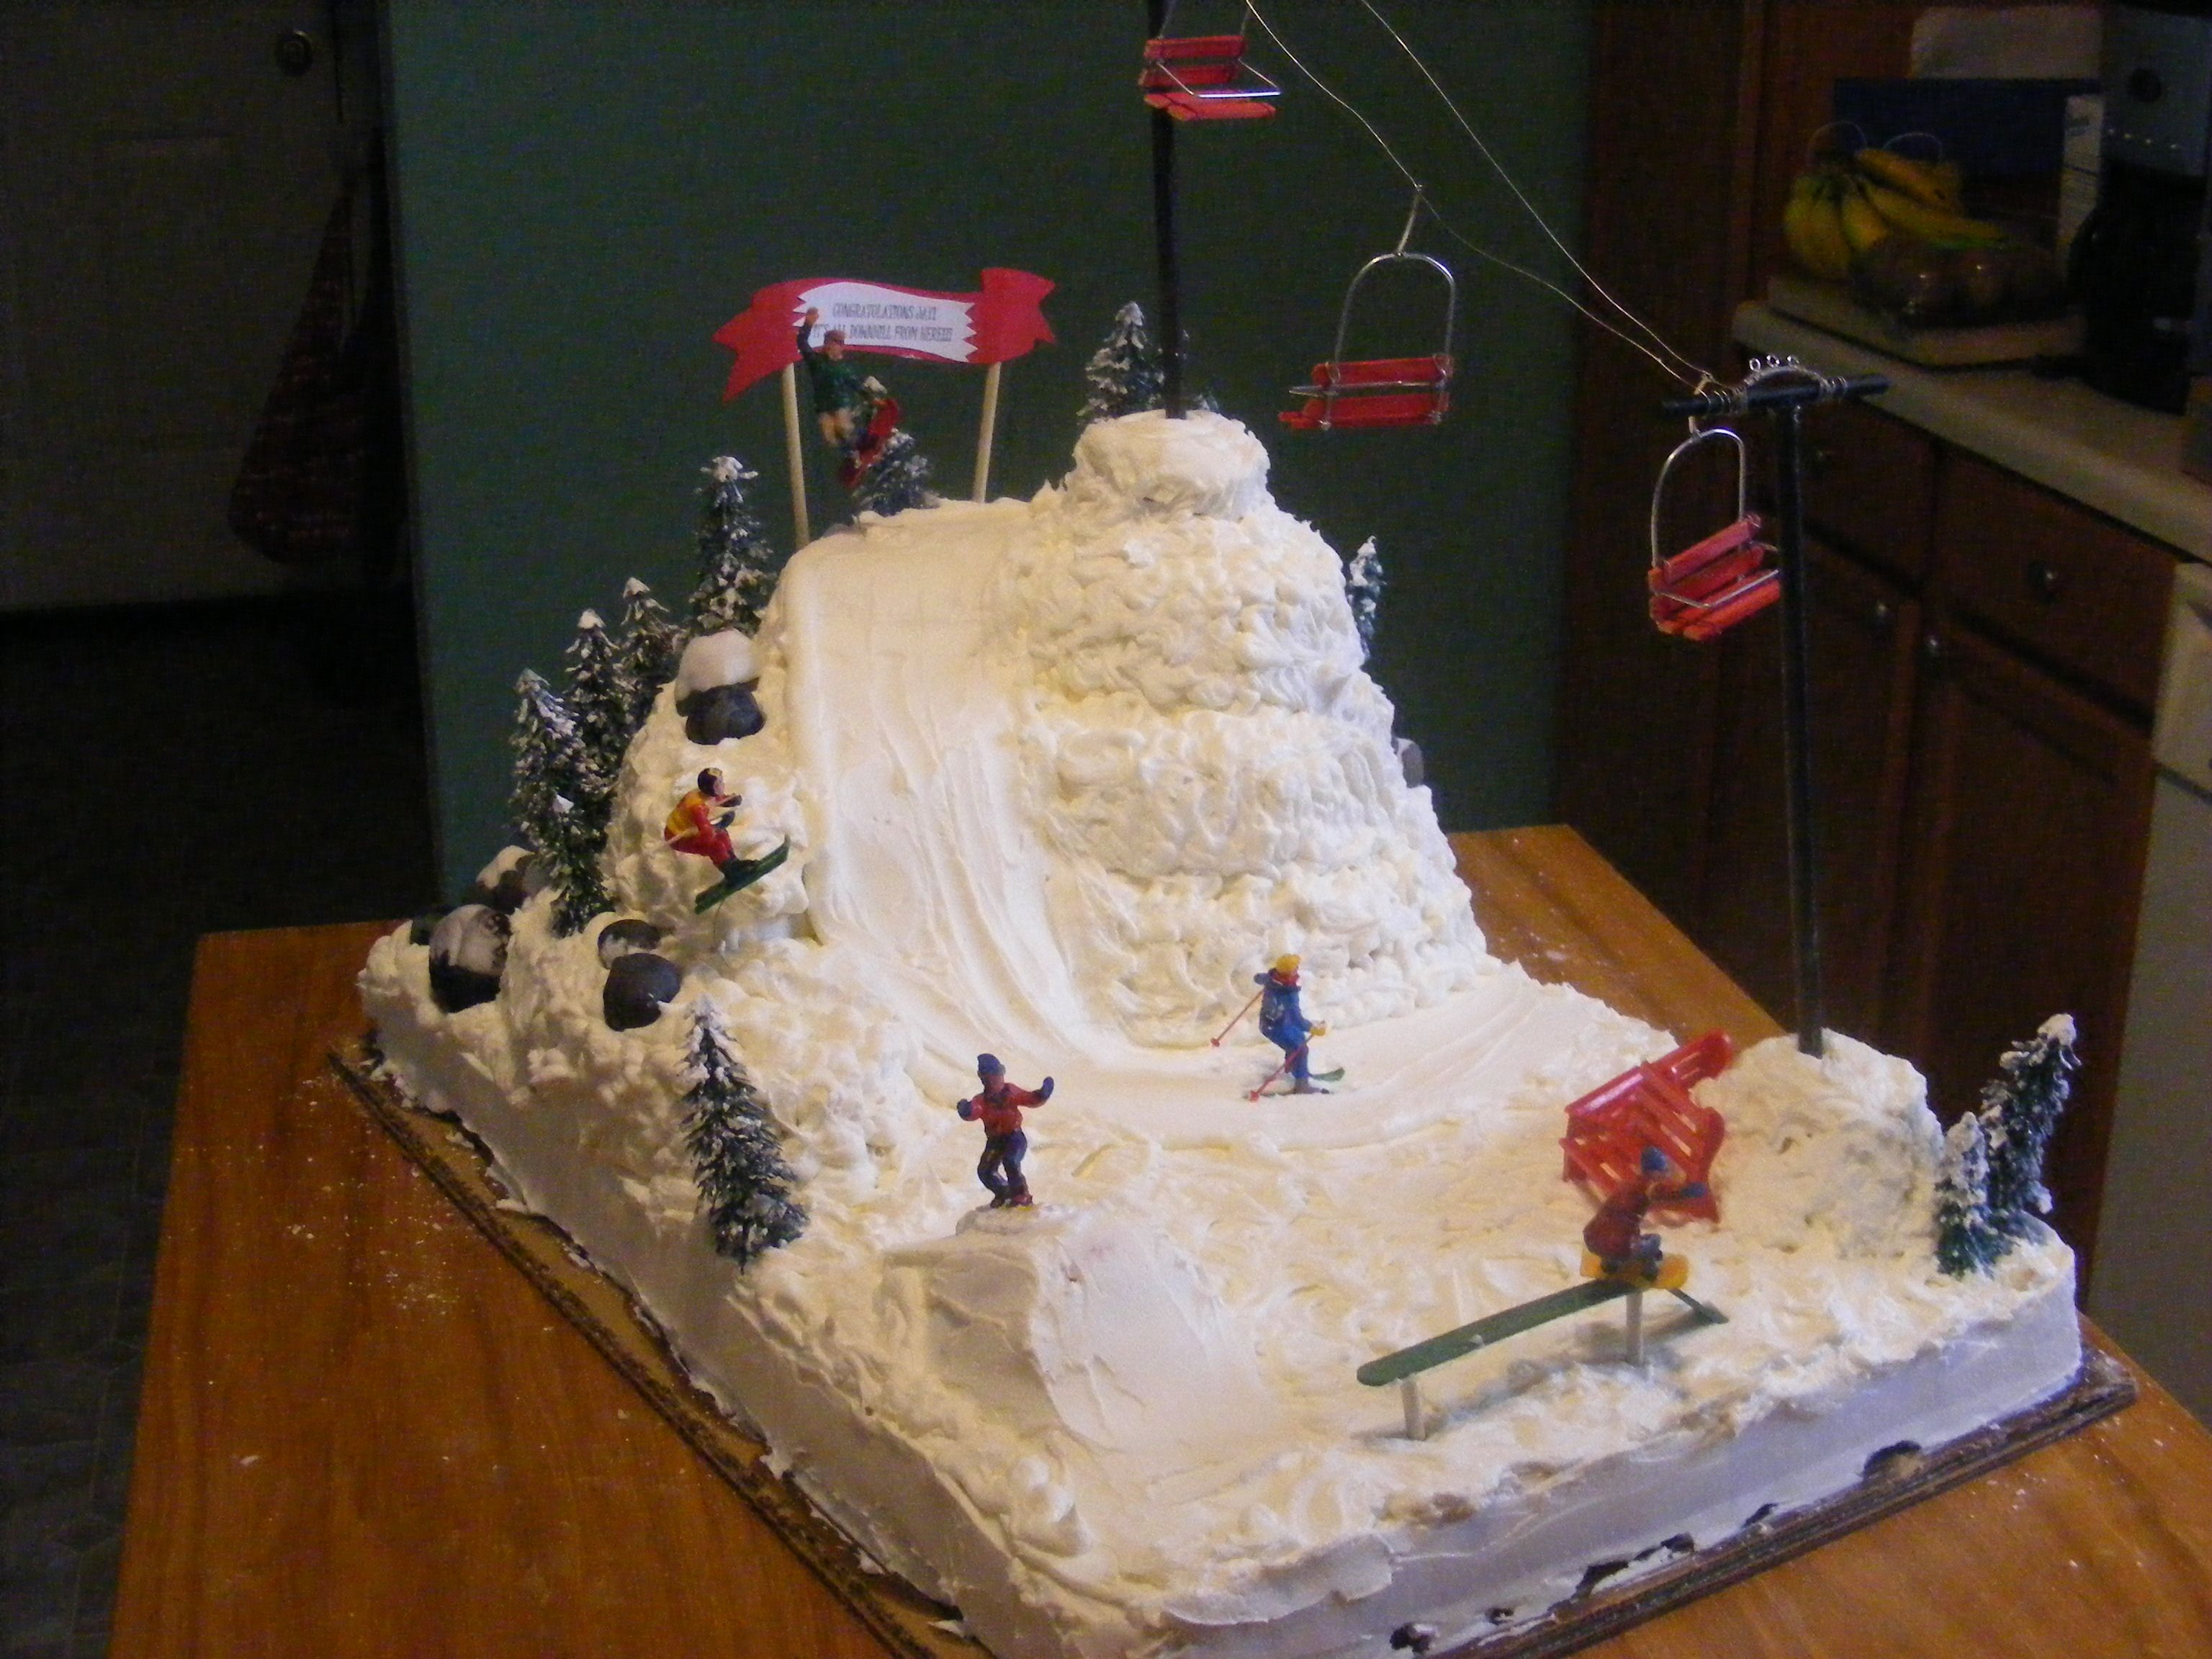 How To Make A Ski Slope Cake